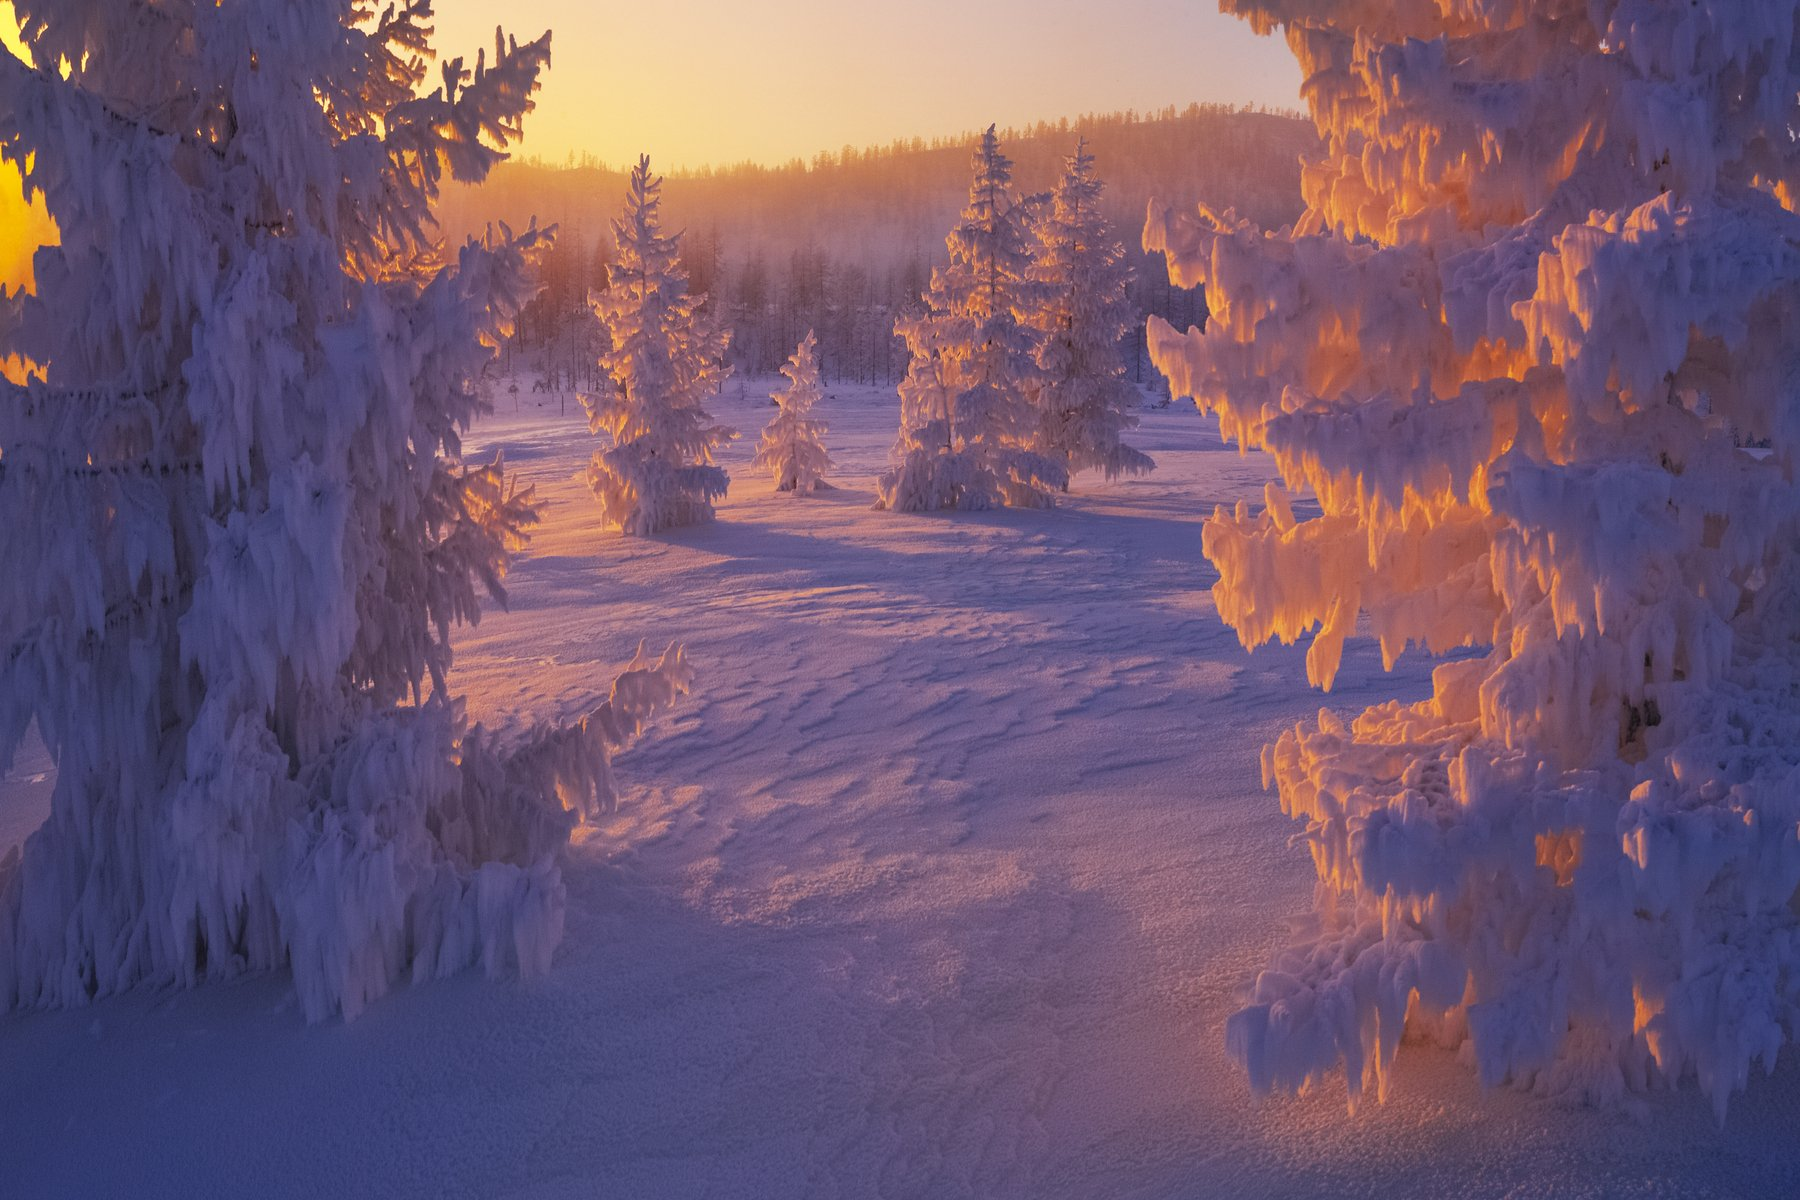 Колыма, Сибирь, зима, мороз, наледь, Владимир Рябков